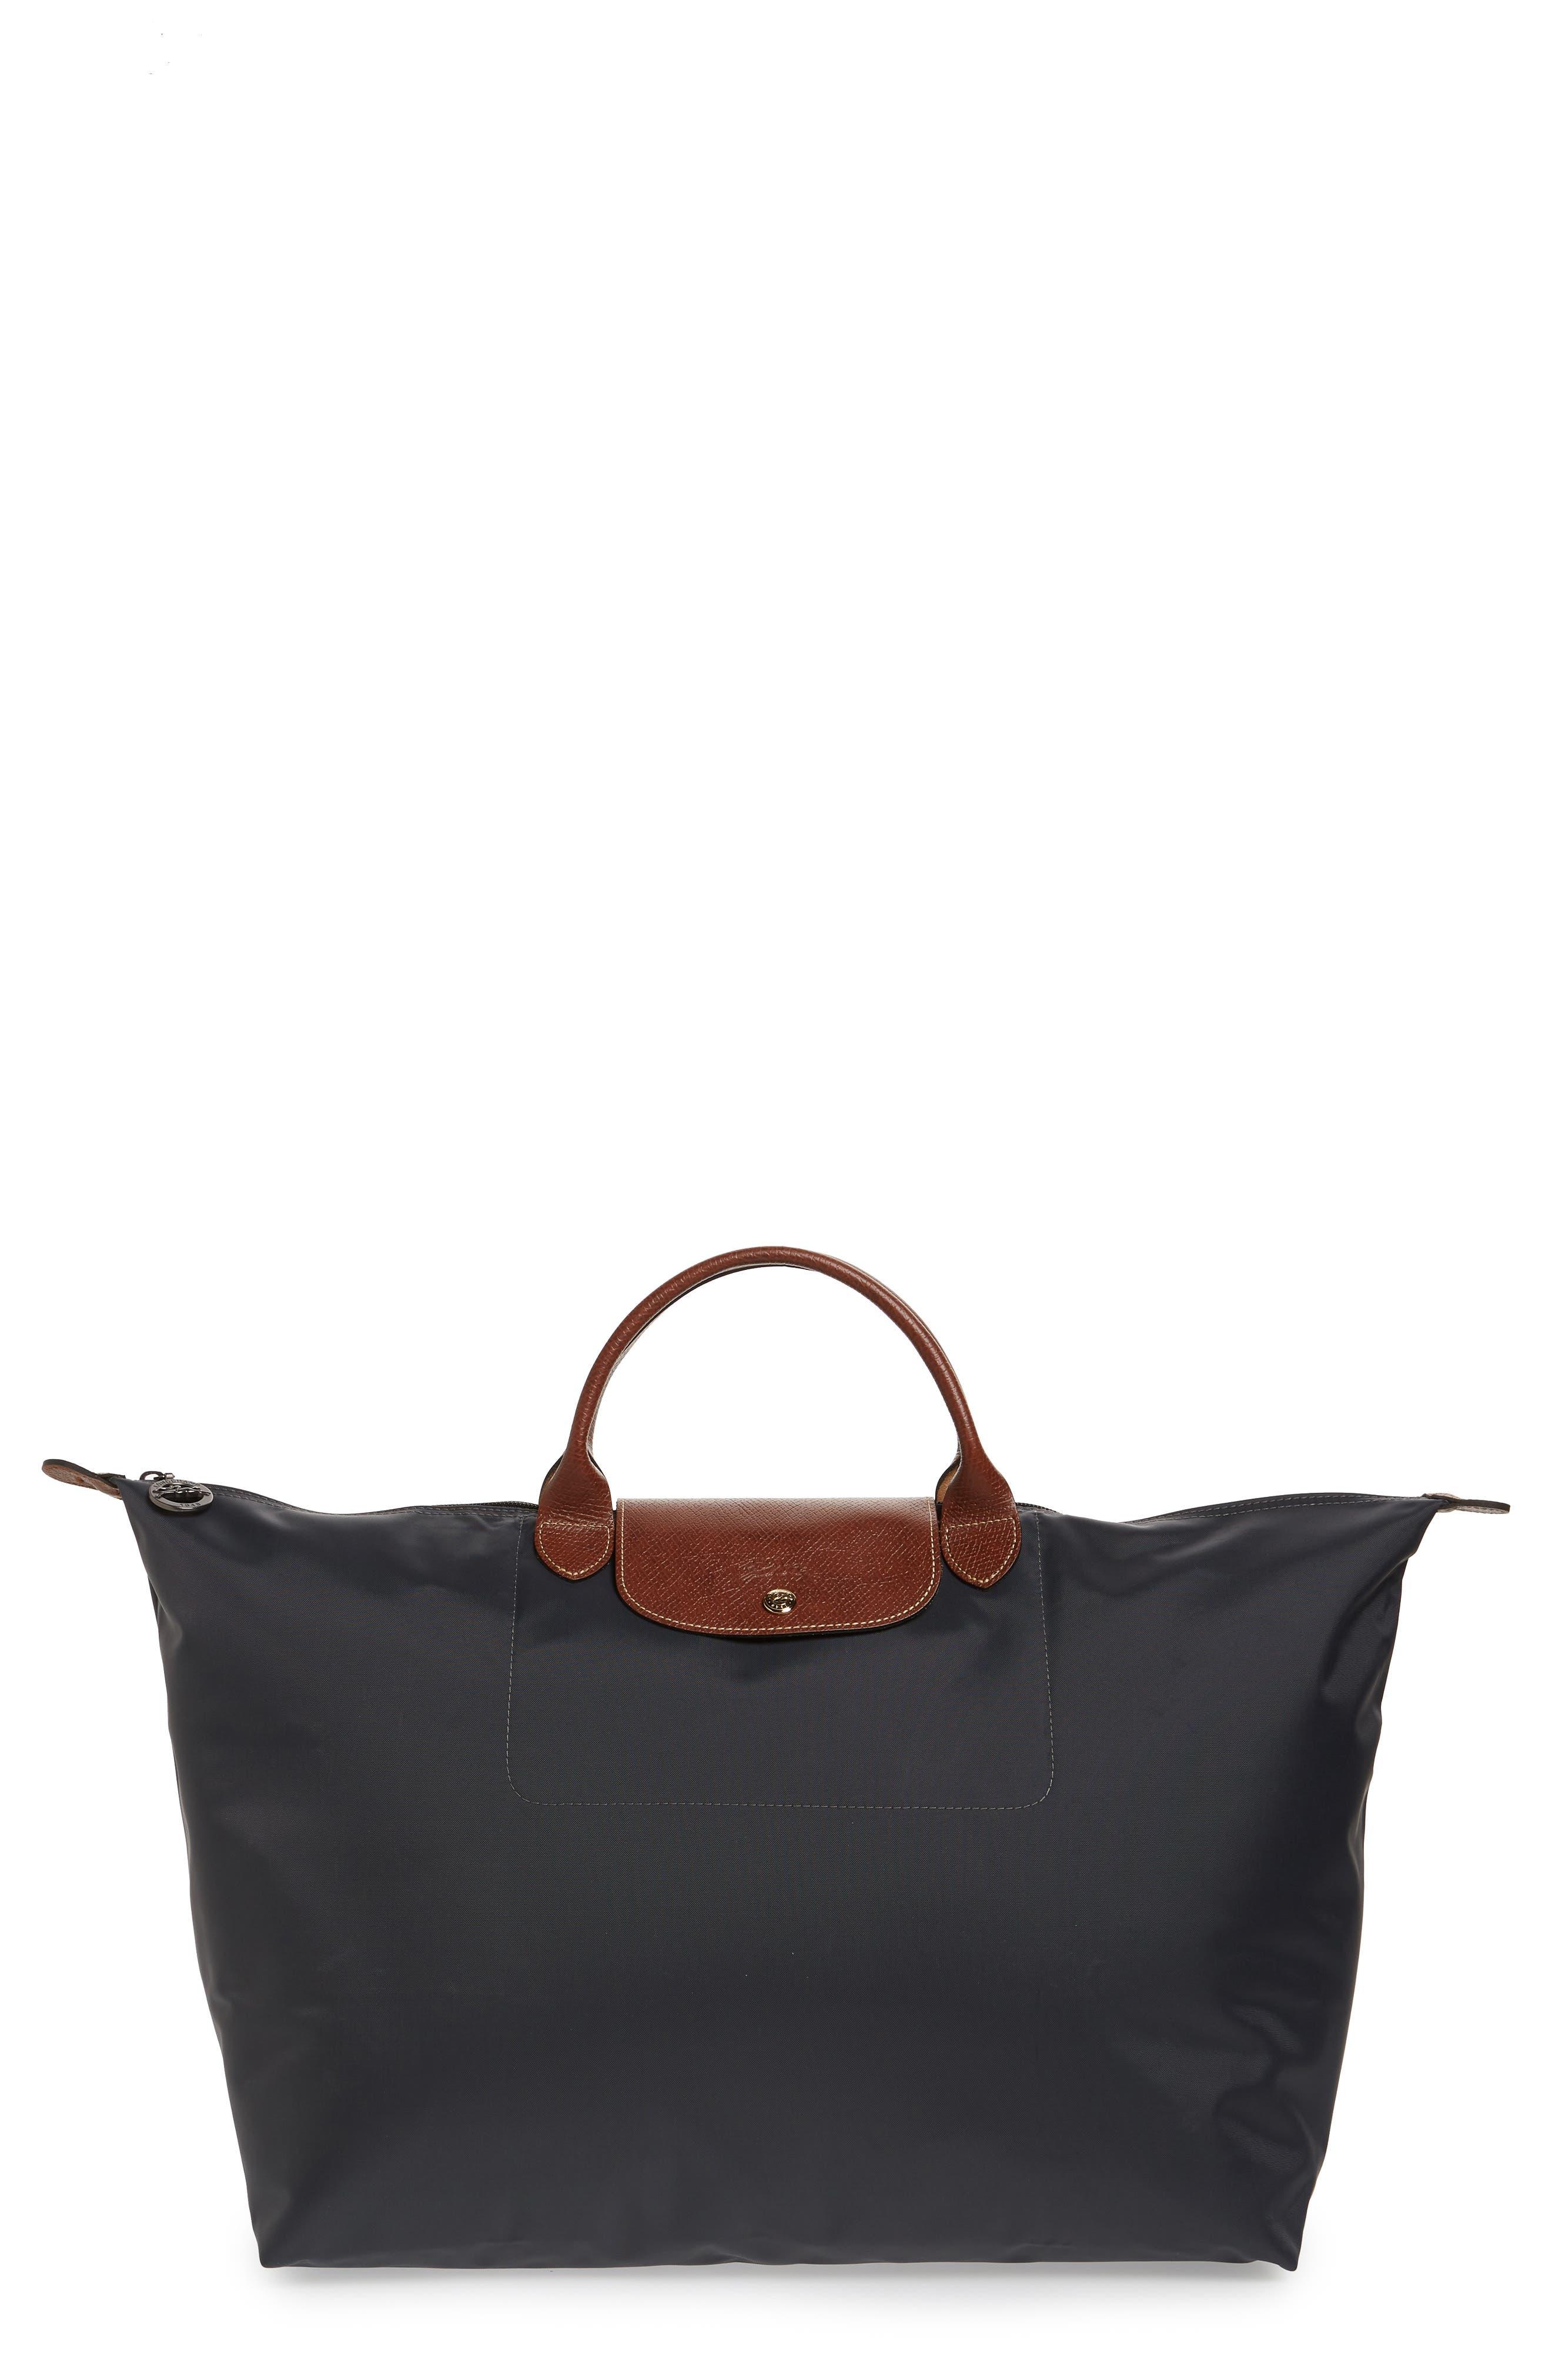 3cbcaafa87c1 Leather (Genuine) Longchamp Bags